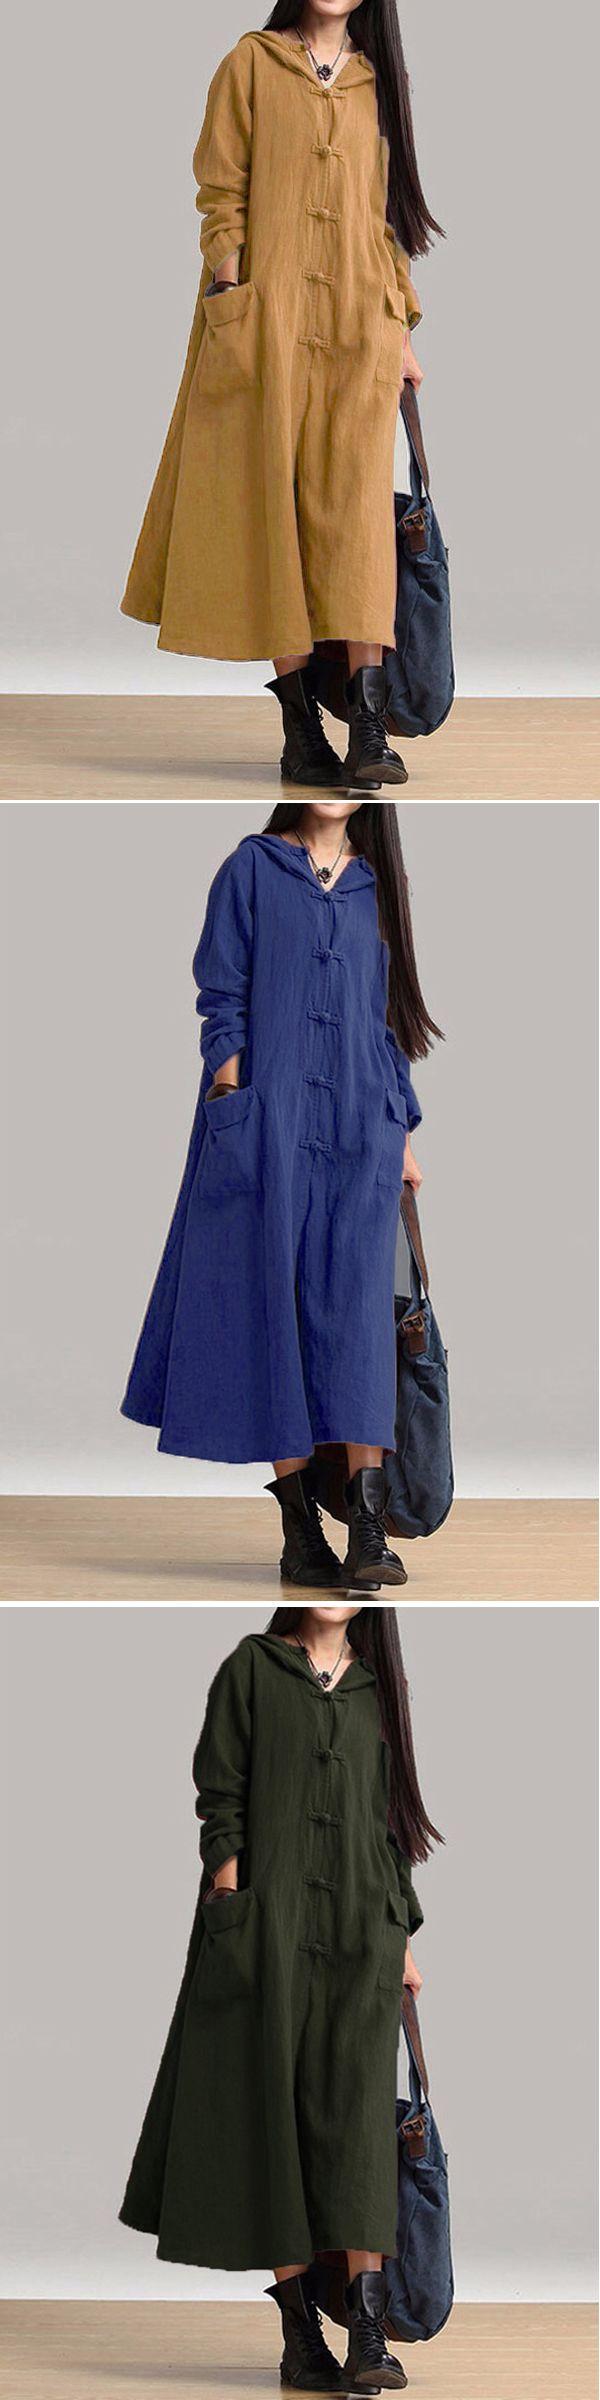 US$ 23.69 Gracila Women Vintage Plate Buckles Long Sleeve Hooded Long Maxi Dresses